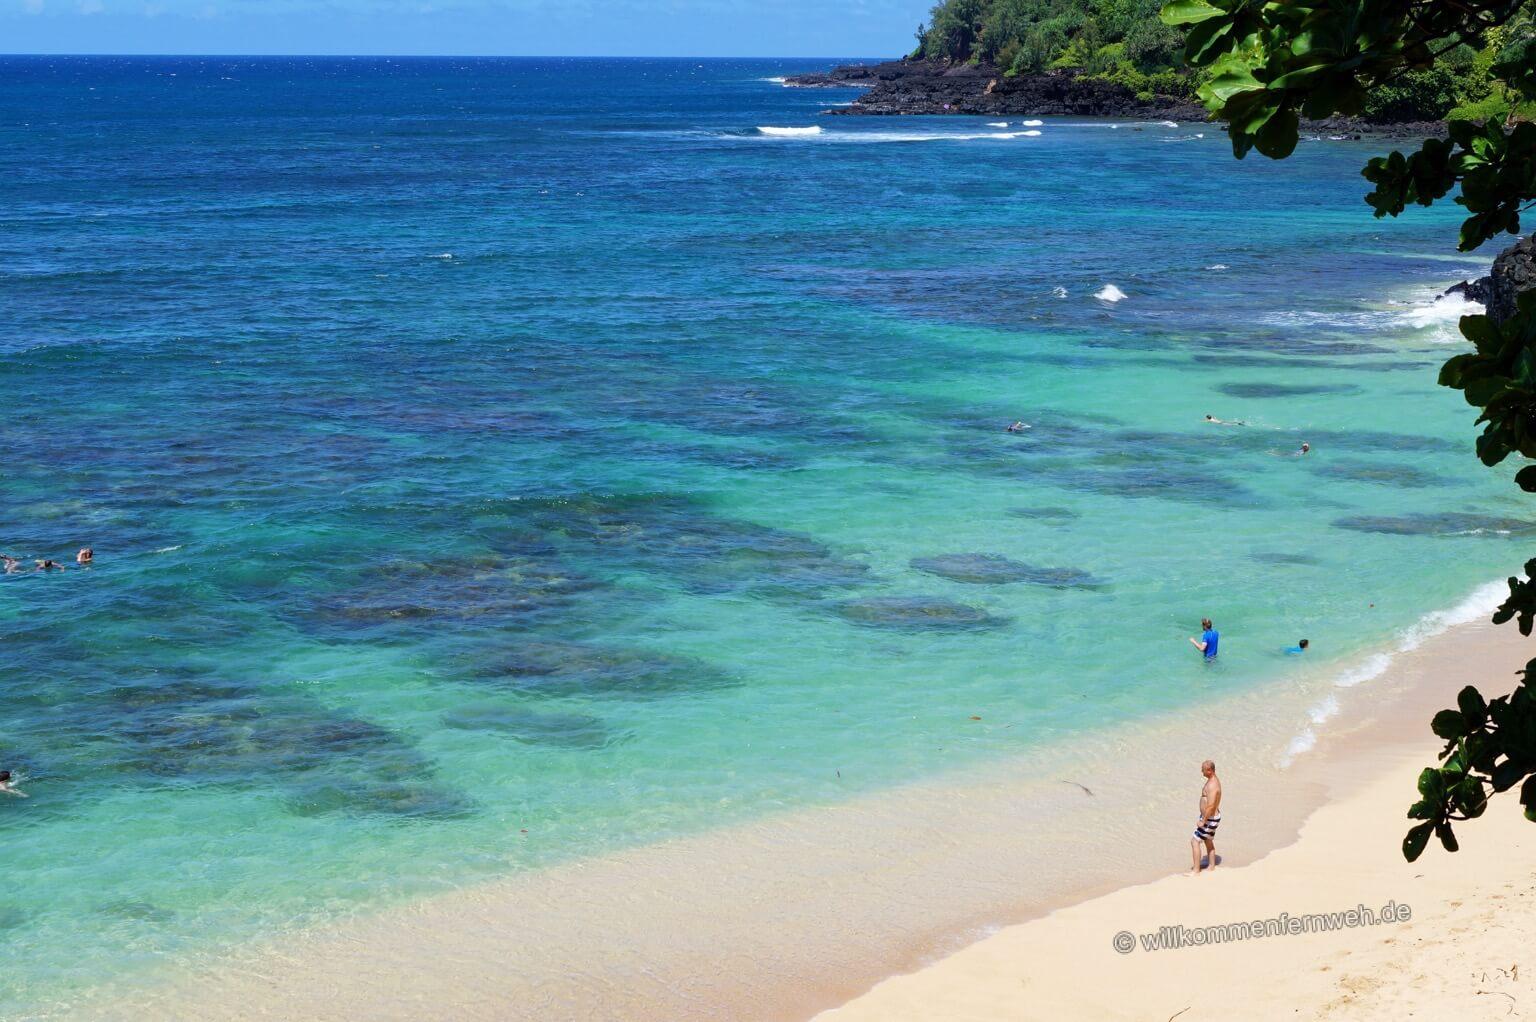 Pali Ke Kua Beach (Hideaways Beach), Kauai